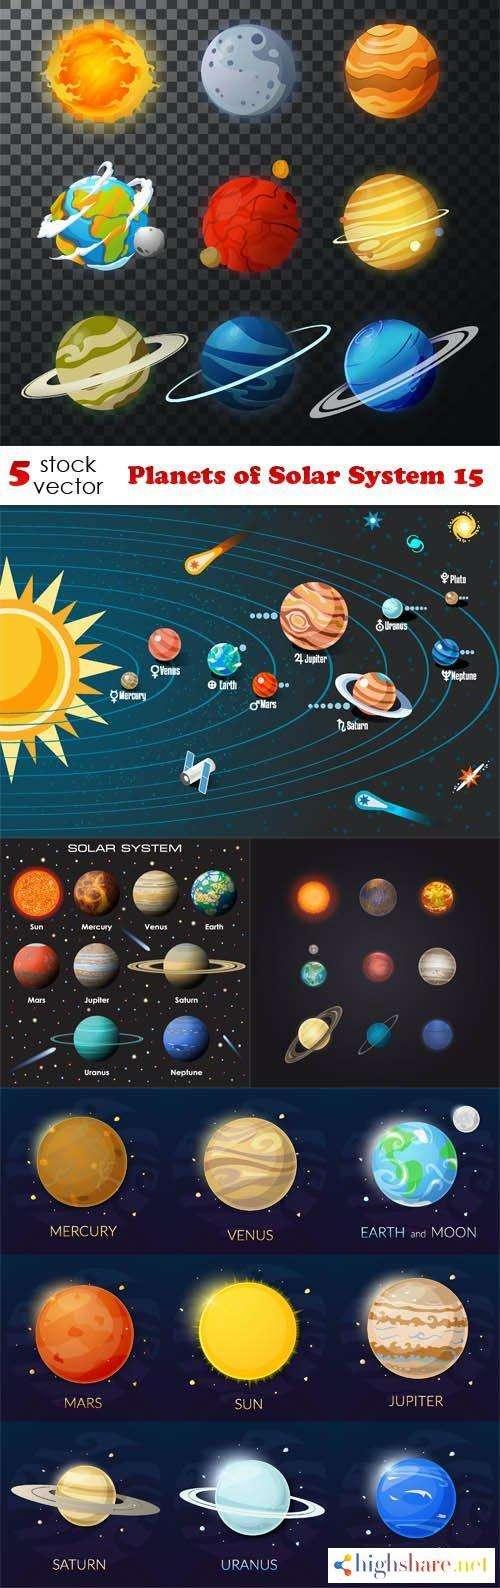 vectors planets of solar system 15 5f421be2b890b - Vectors - Planets of Solar System 15